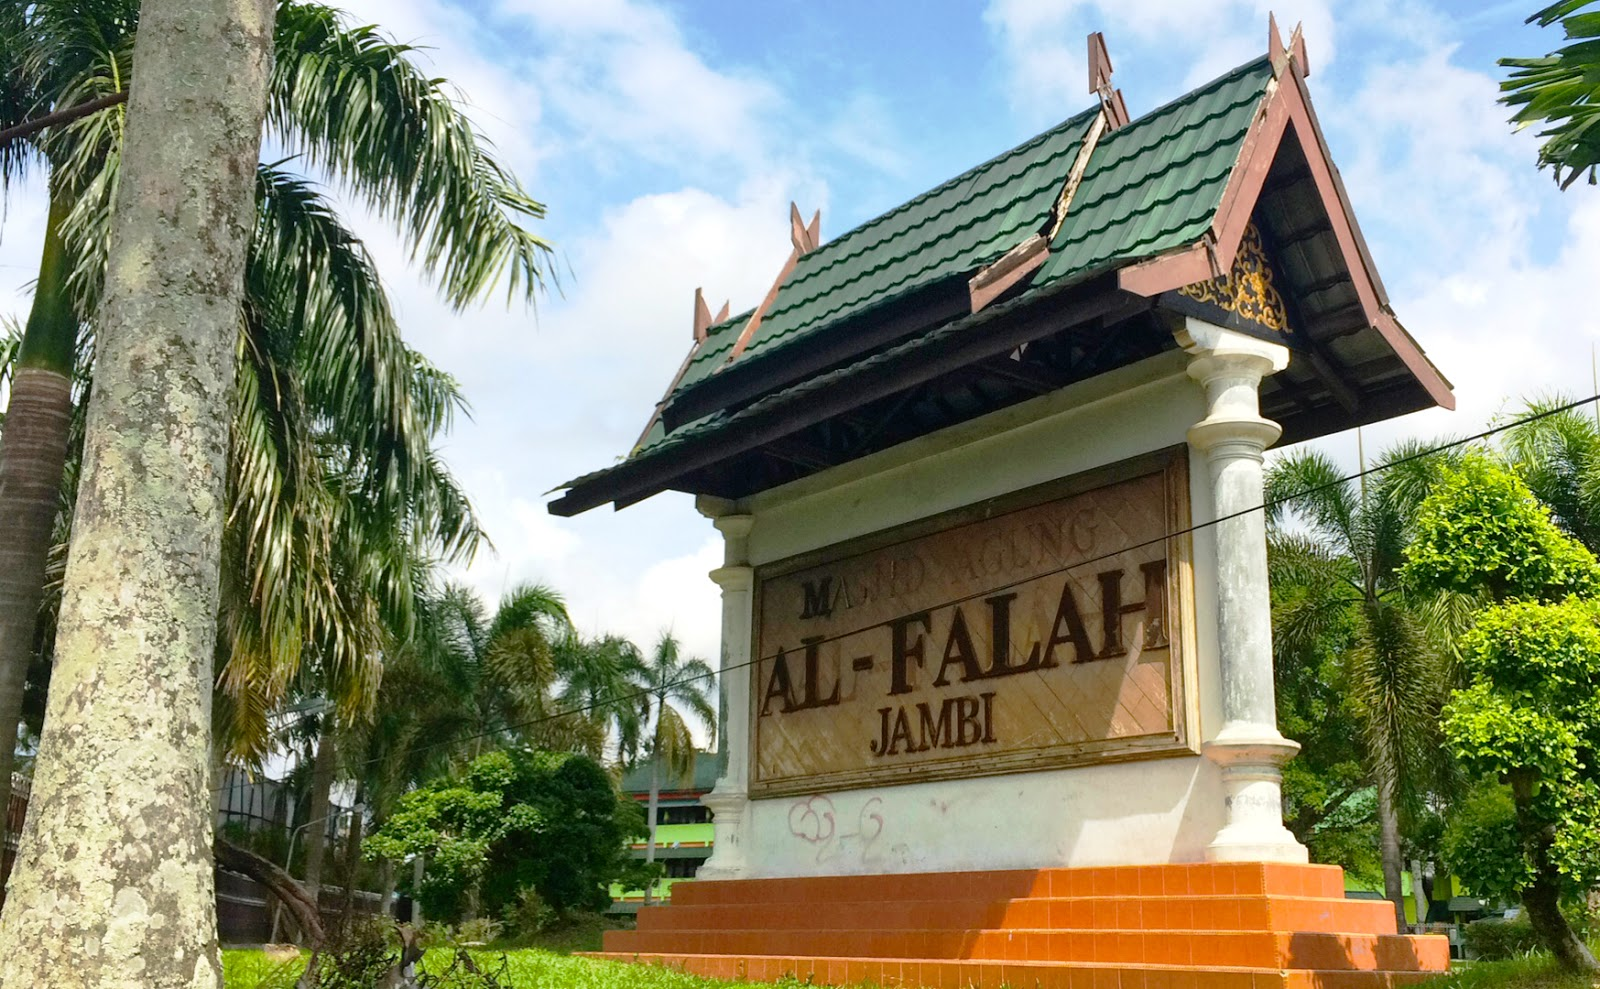 Jalan Kota Jambi Sehari Adambition Ulasan Foto Lengkap Mengenai Masjid